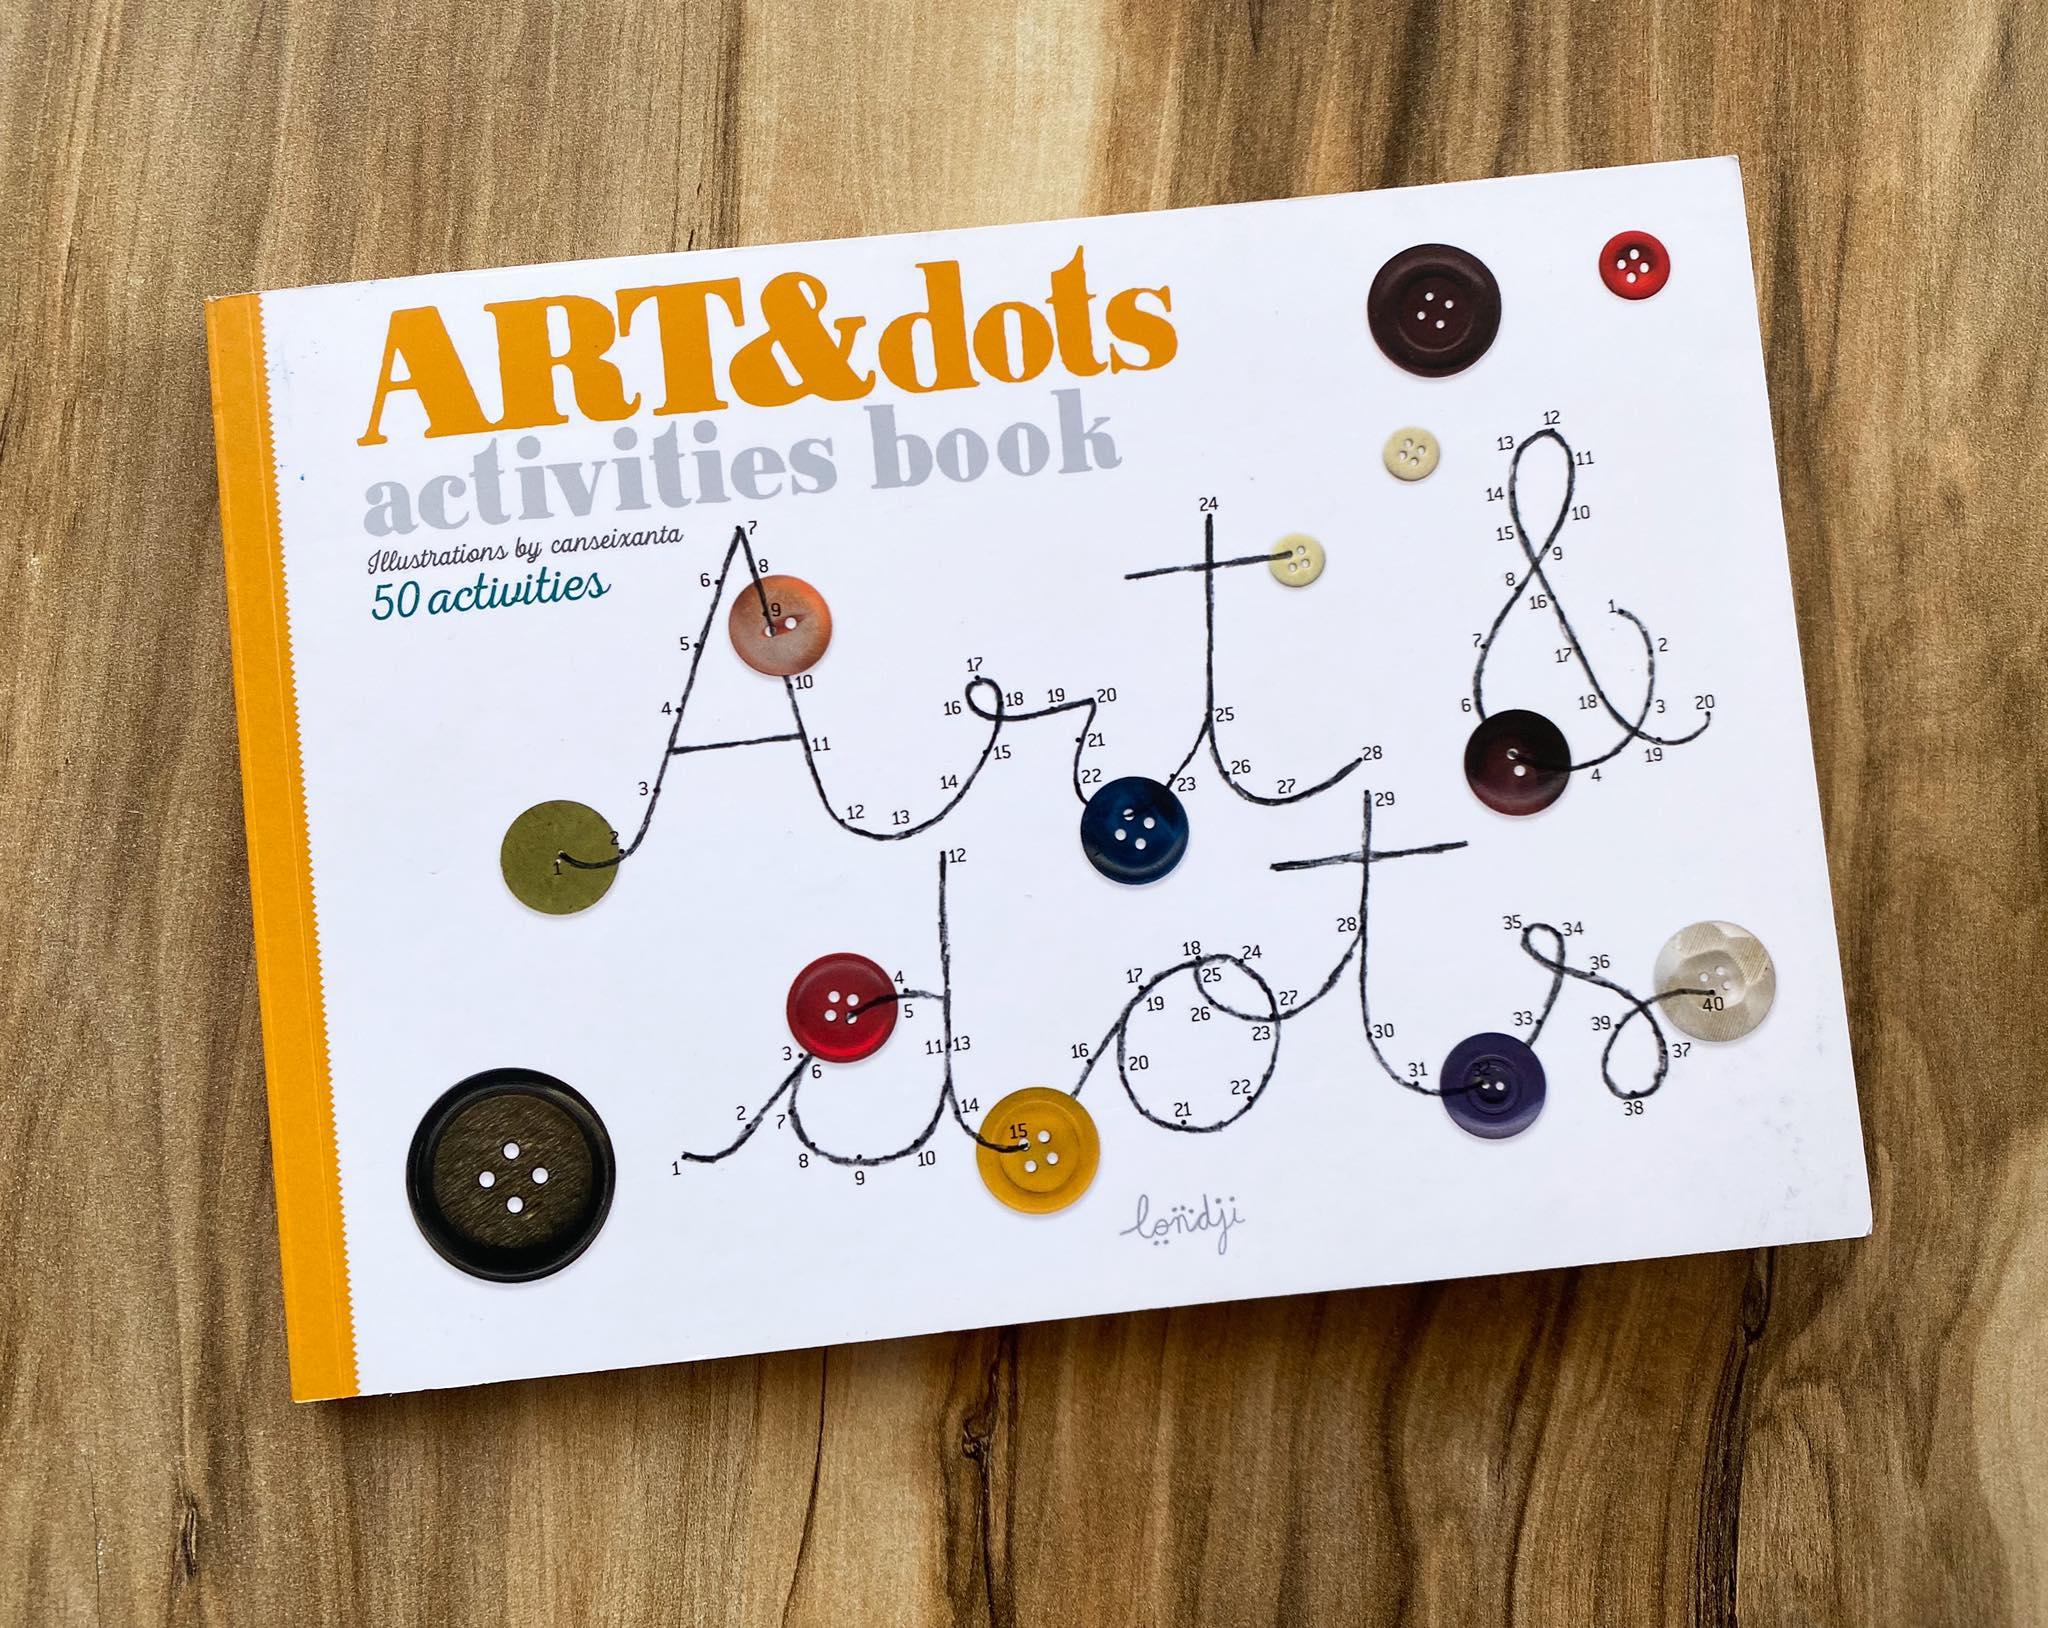 zeszyt kreawtyny Art & dots